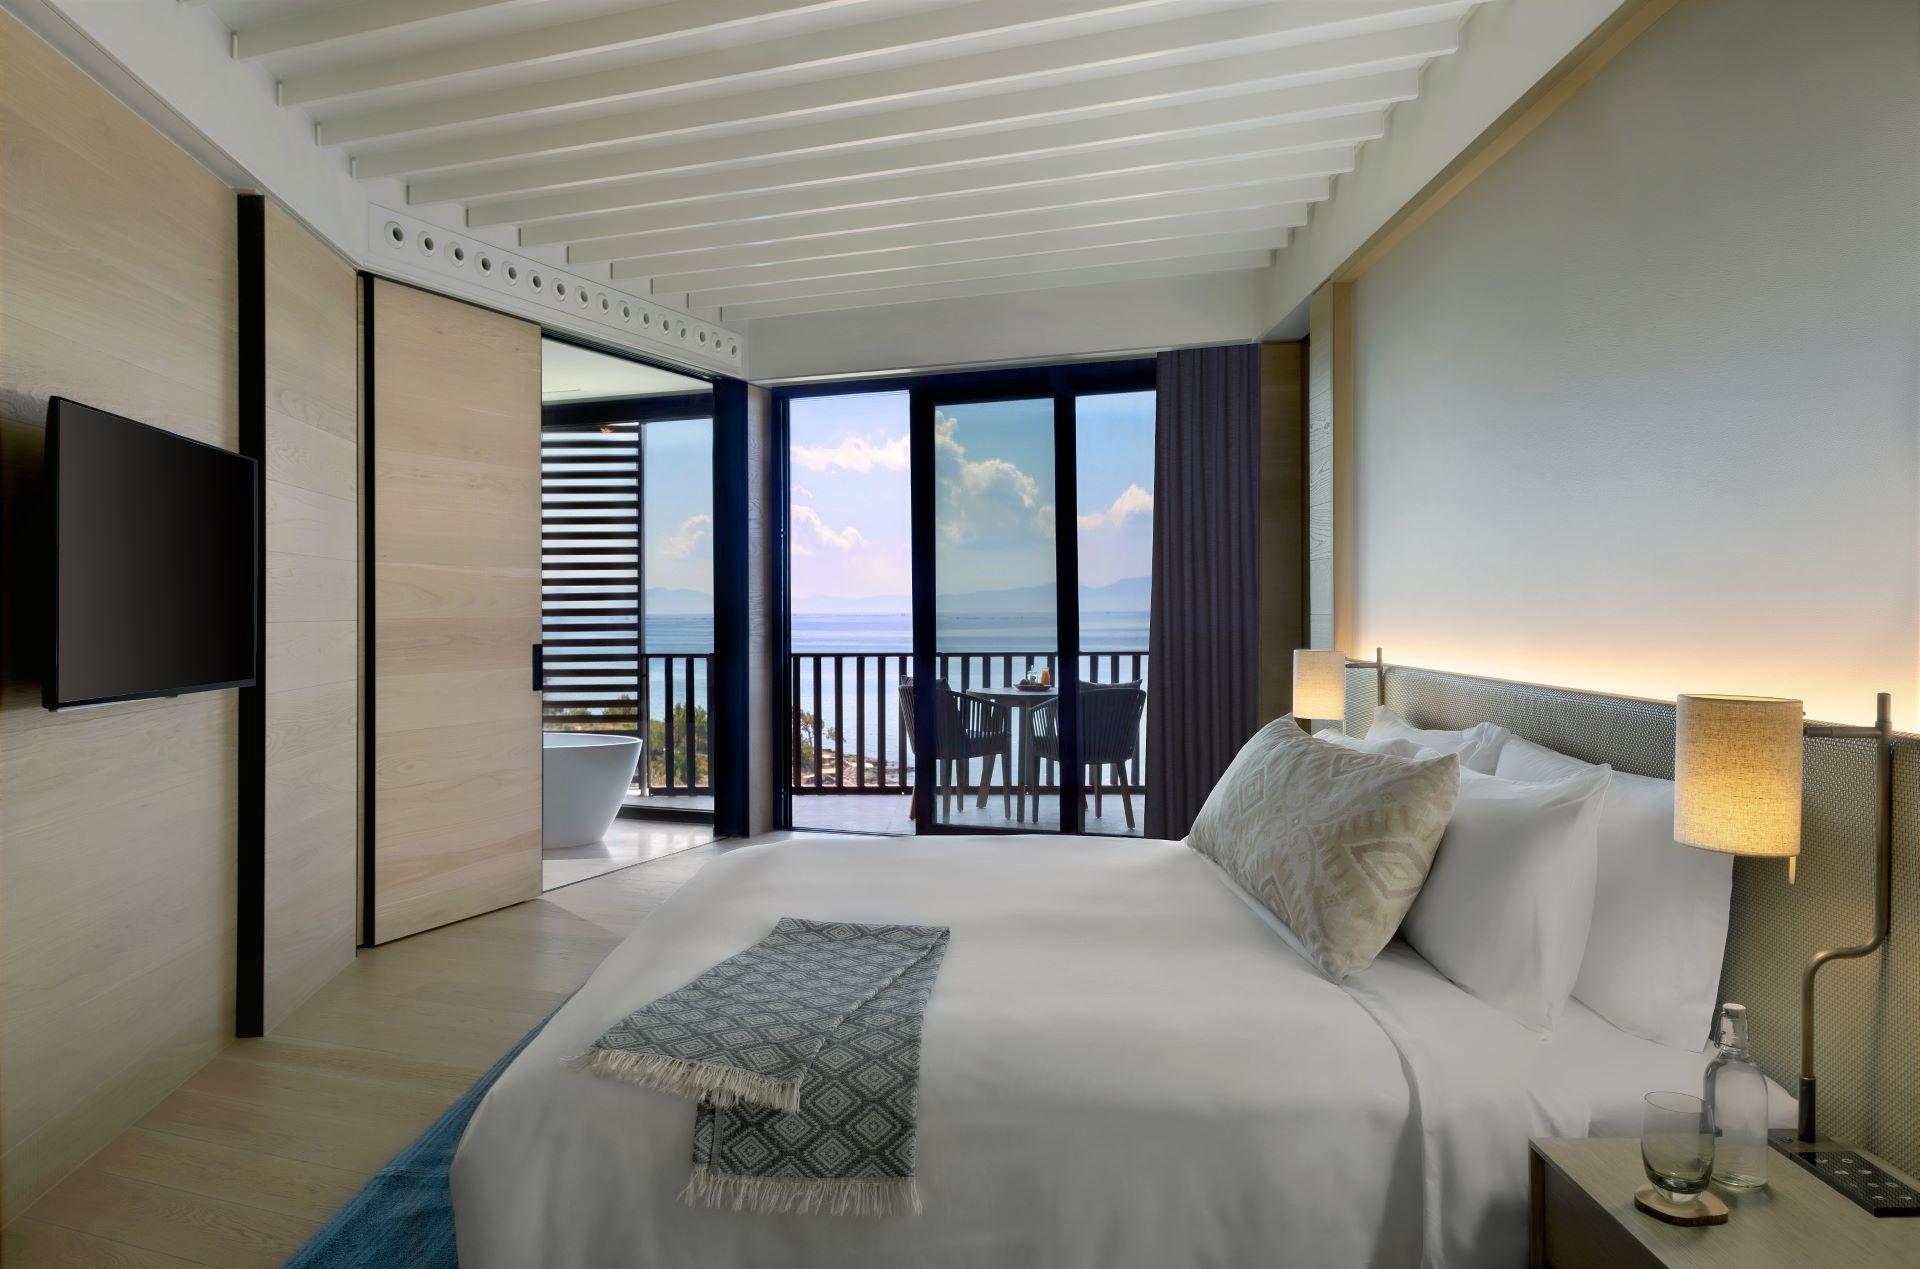 Seaview Deluxe Room en Six Senses Kaplankaya